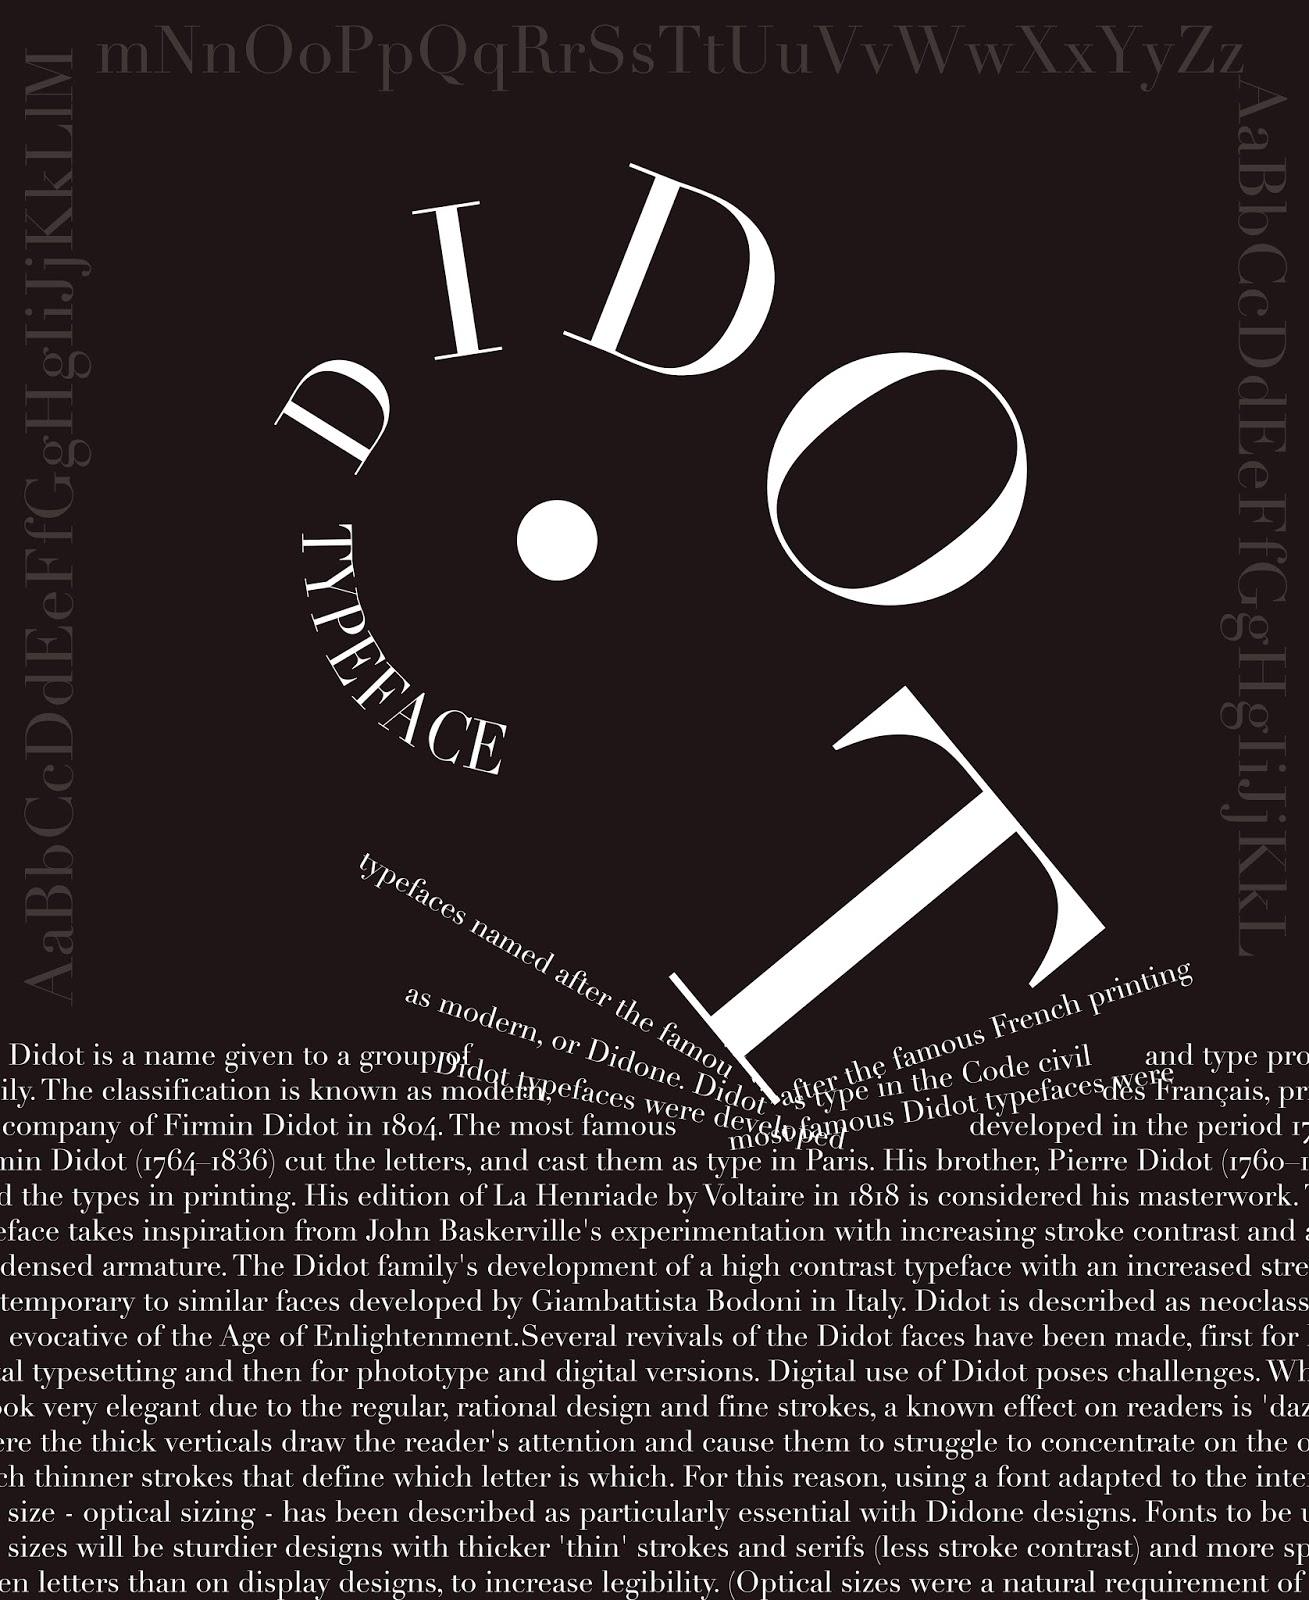 Imagemaking: Didot Typography Poster